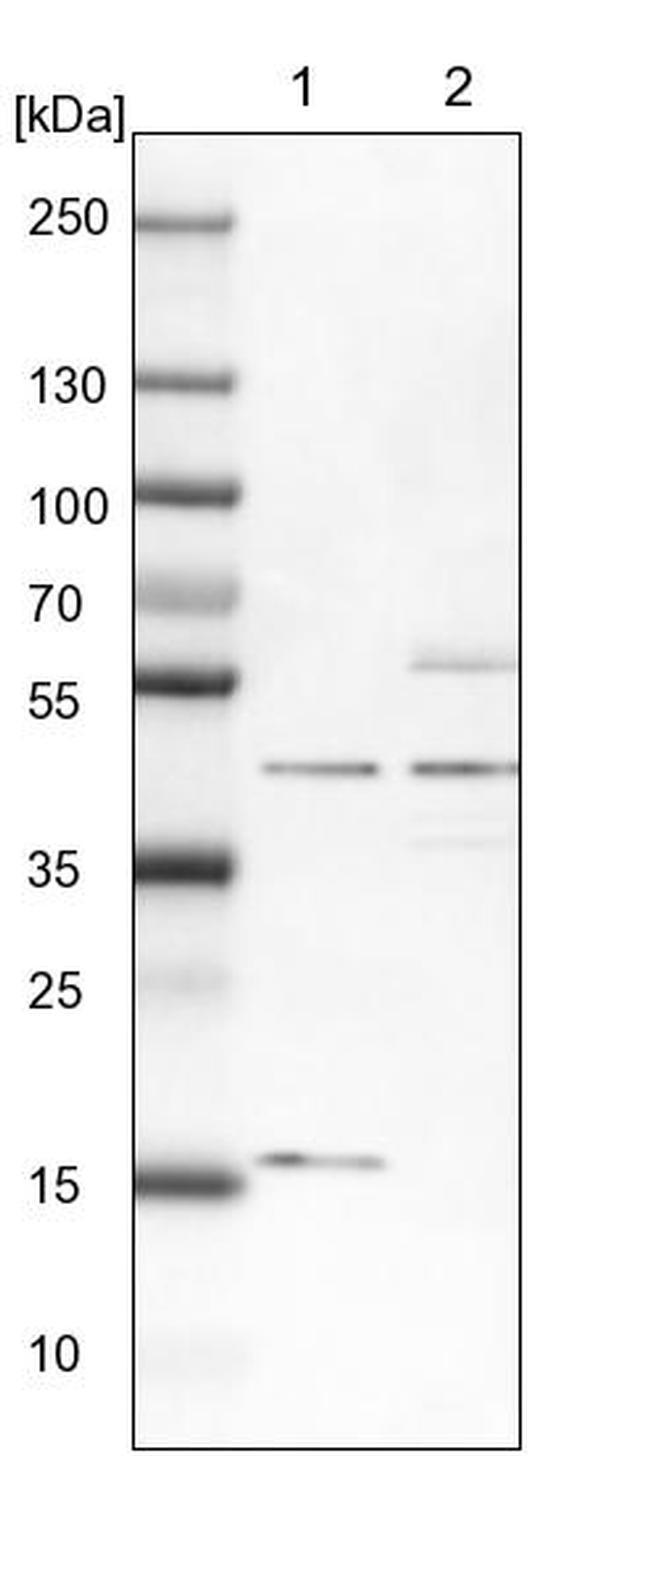 TBC1D13 Antibody in Western Blot (WB)